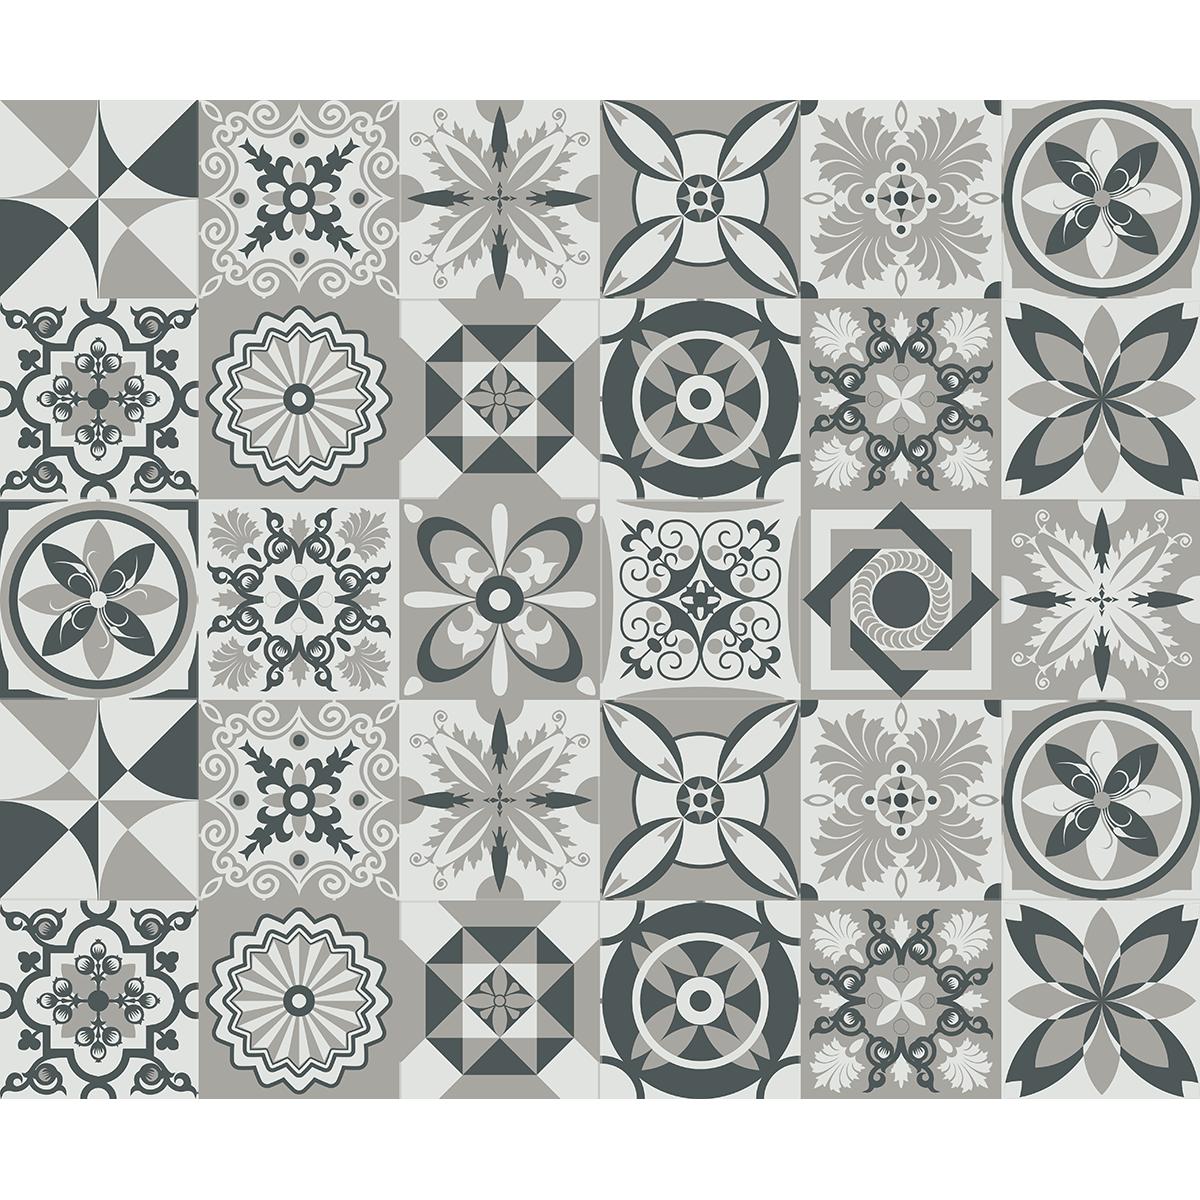 30 stickers carreaux de ciment azulejos juonas cuisine carrelages ambiance sticker. Black Bedroom Furniture Sets. Home Design Ideas